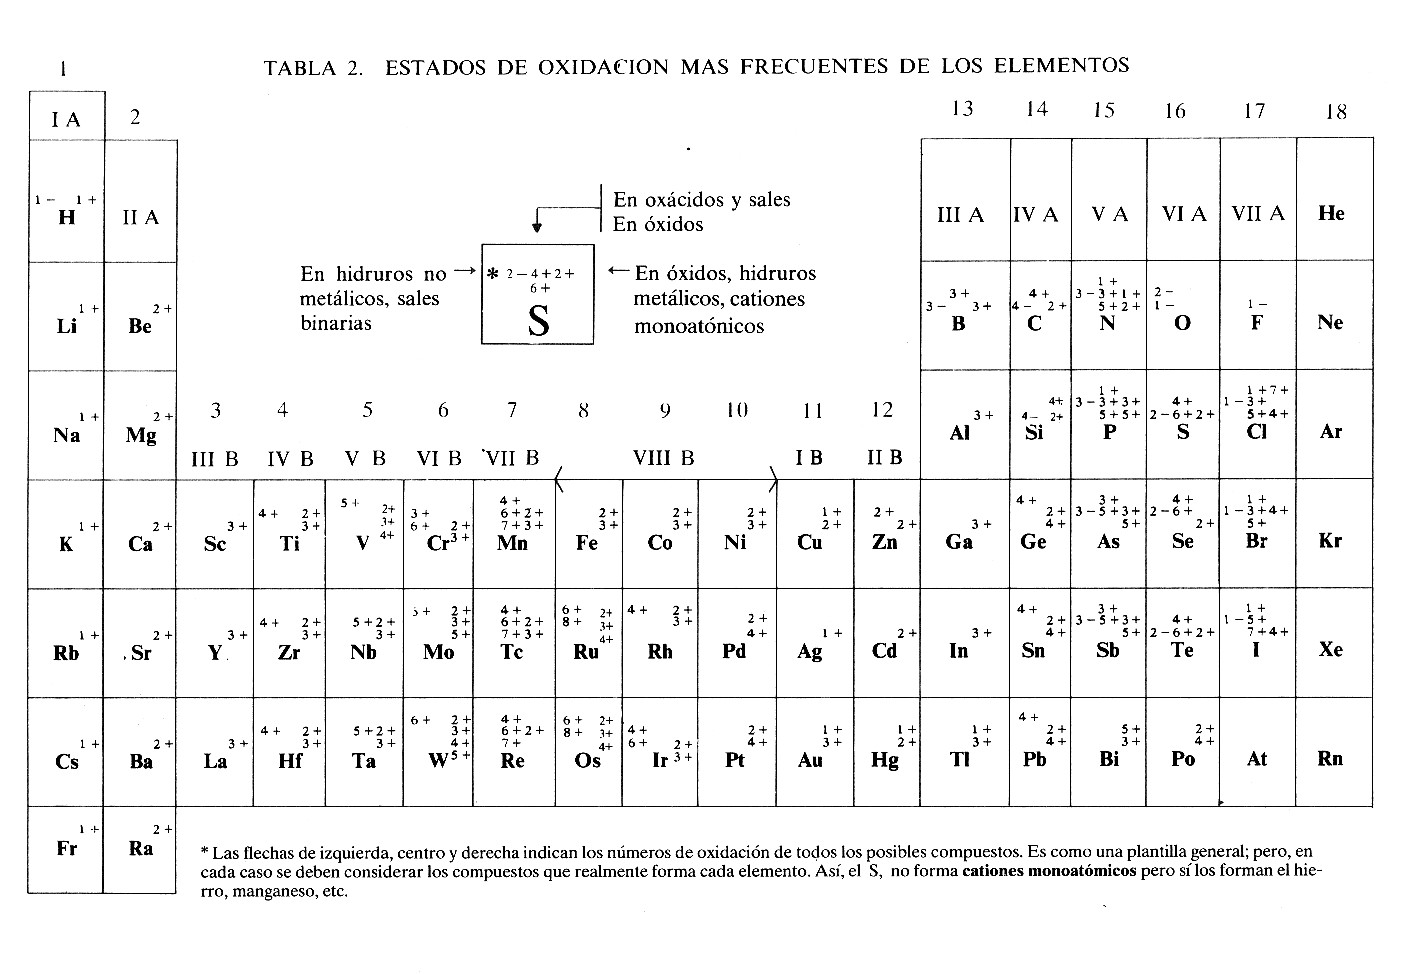 Fsica qumica y mucho ms tabla peridica con estados de oxidacin tabla peridica con estados de oxidacin urtaz Gallery